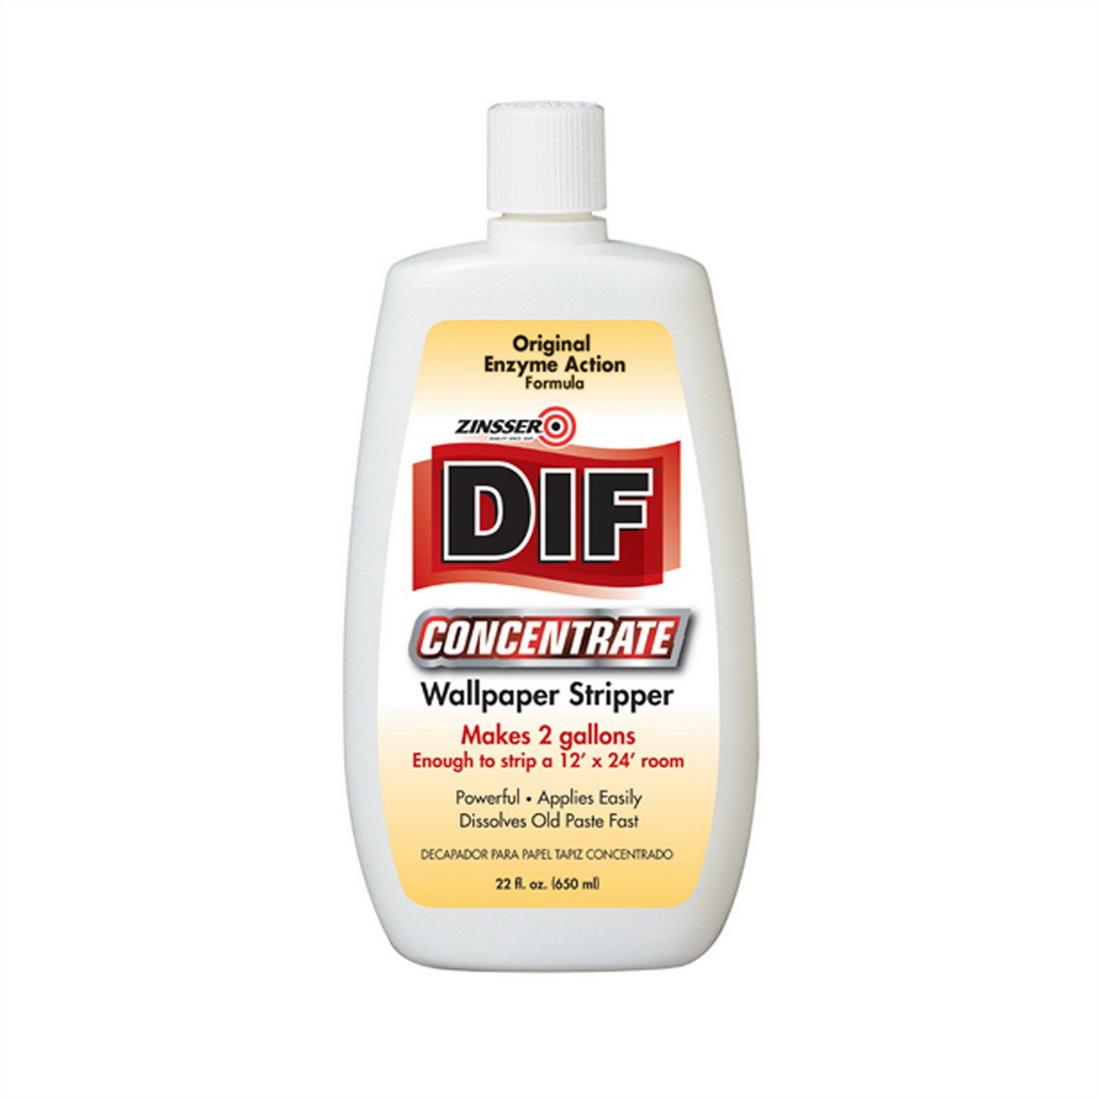 Rust-Oleum  DIF Liquid Concentrate Wall Paper Stripper 650mL HZ02422